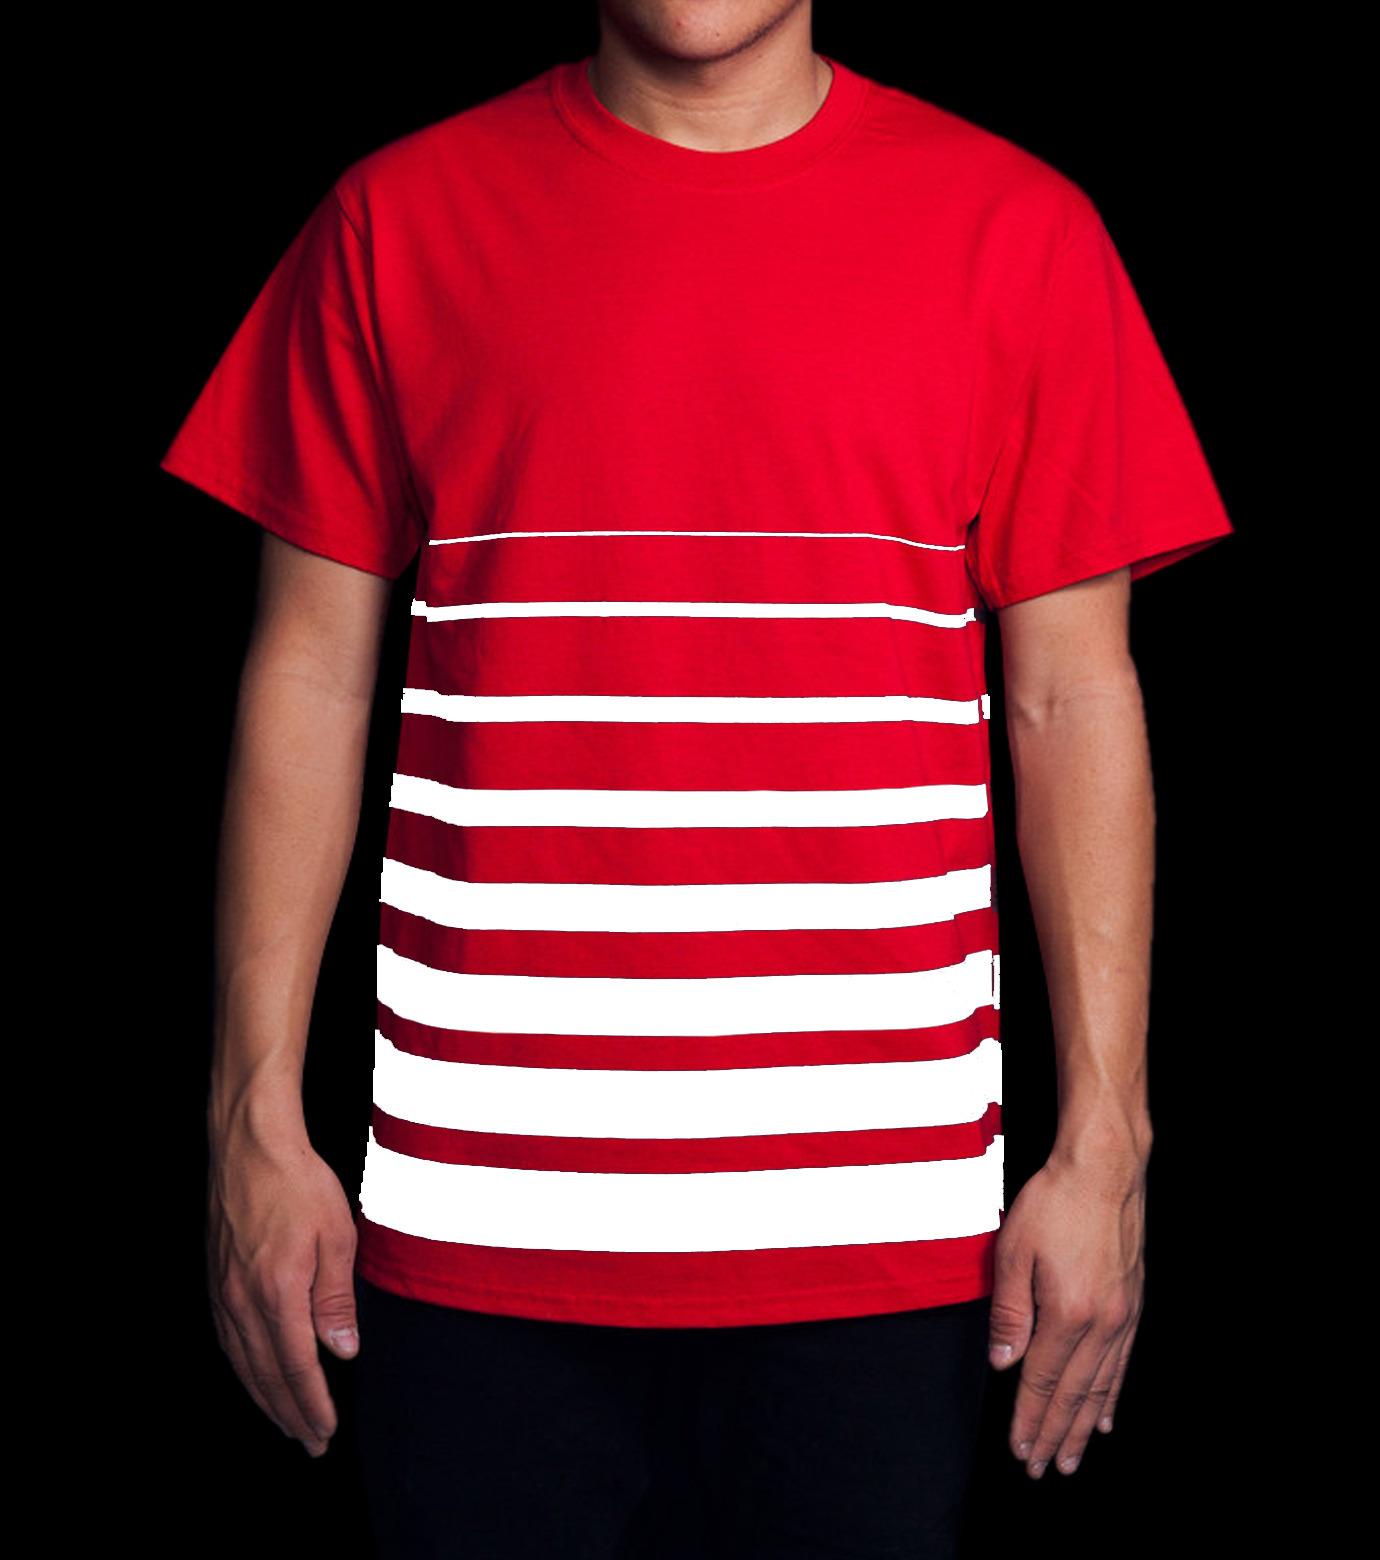 ICNY(アイ・シー・エヌ・ワイ)のGradient T-shirts-RED(T-SHIRTS/T-SHIRTS)-GRDT-62 拡大詳細画像4